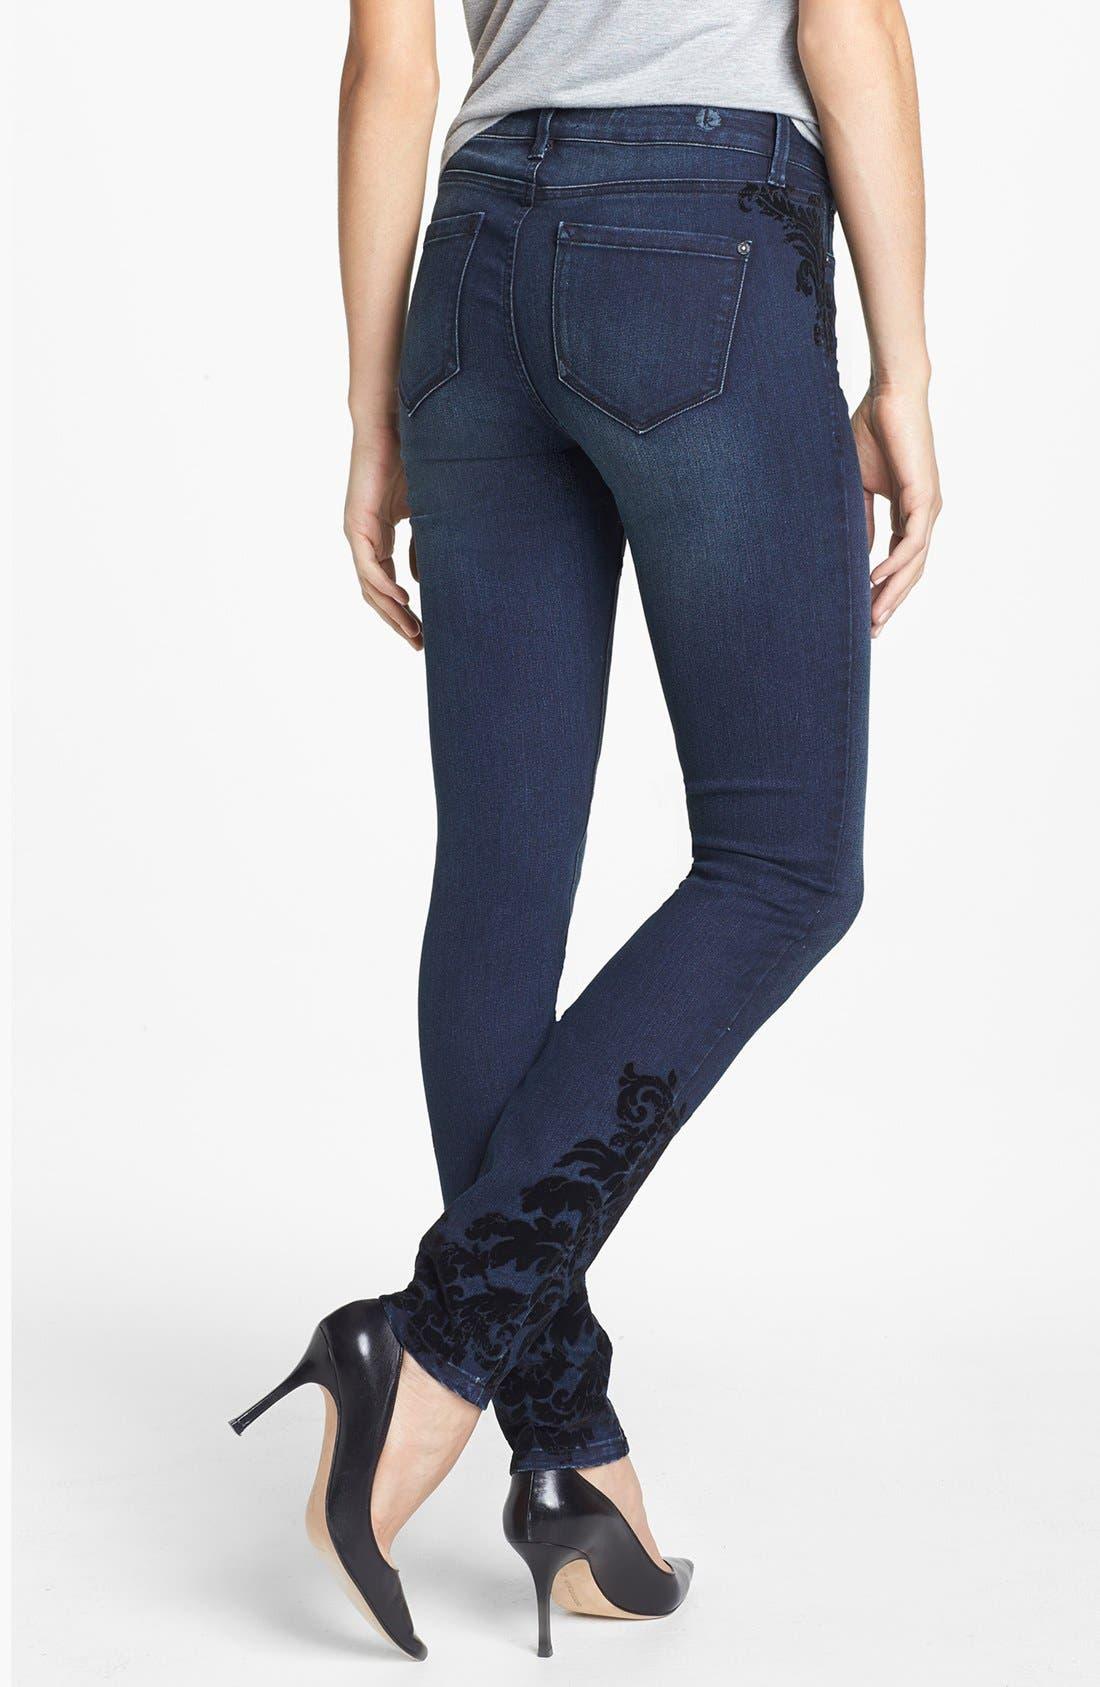 Alternate Image 2  - kensie 'Ankle Biter' Flocked Skinny Jeans (Midnight)